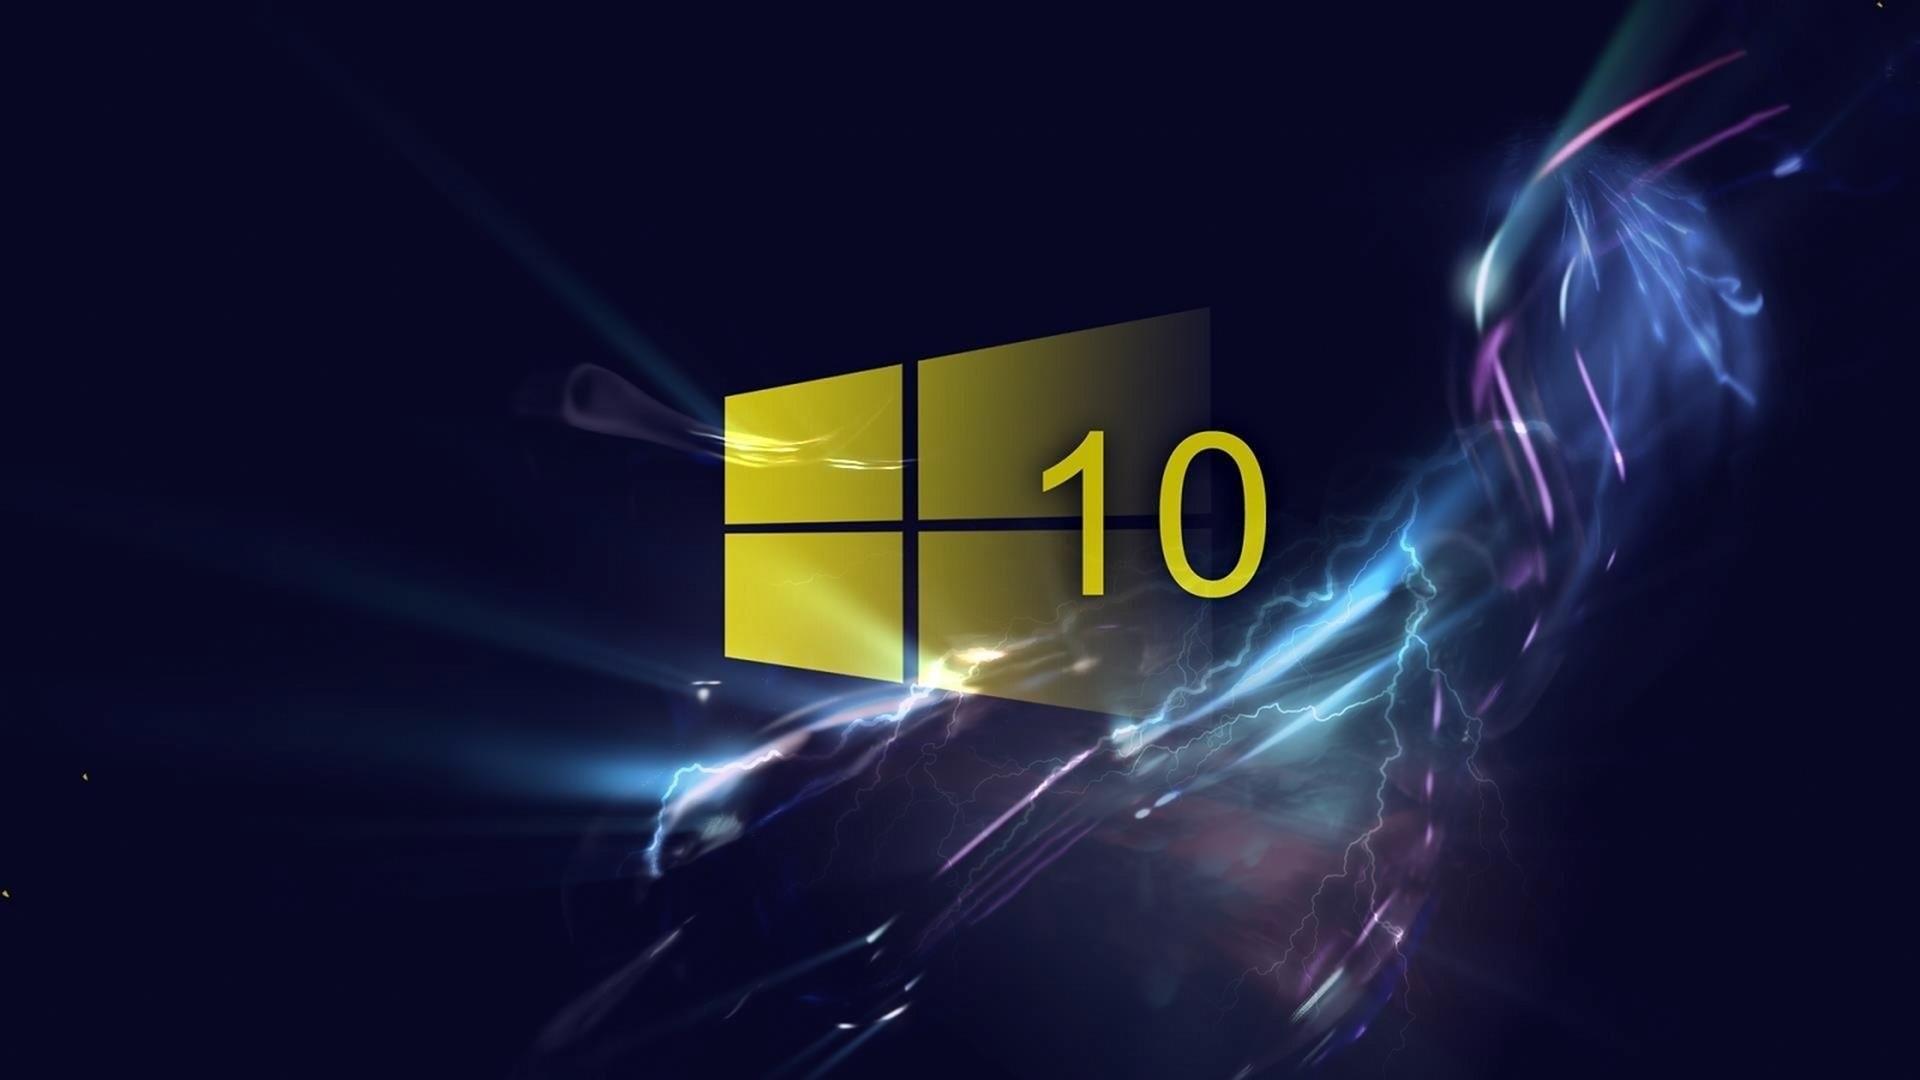 HD Wallpaper   Background ID:641448. Technology Windows 10